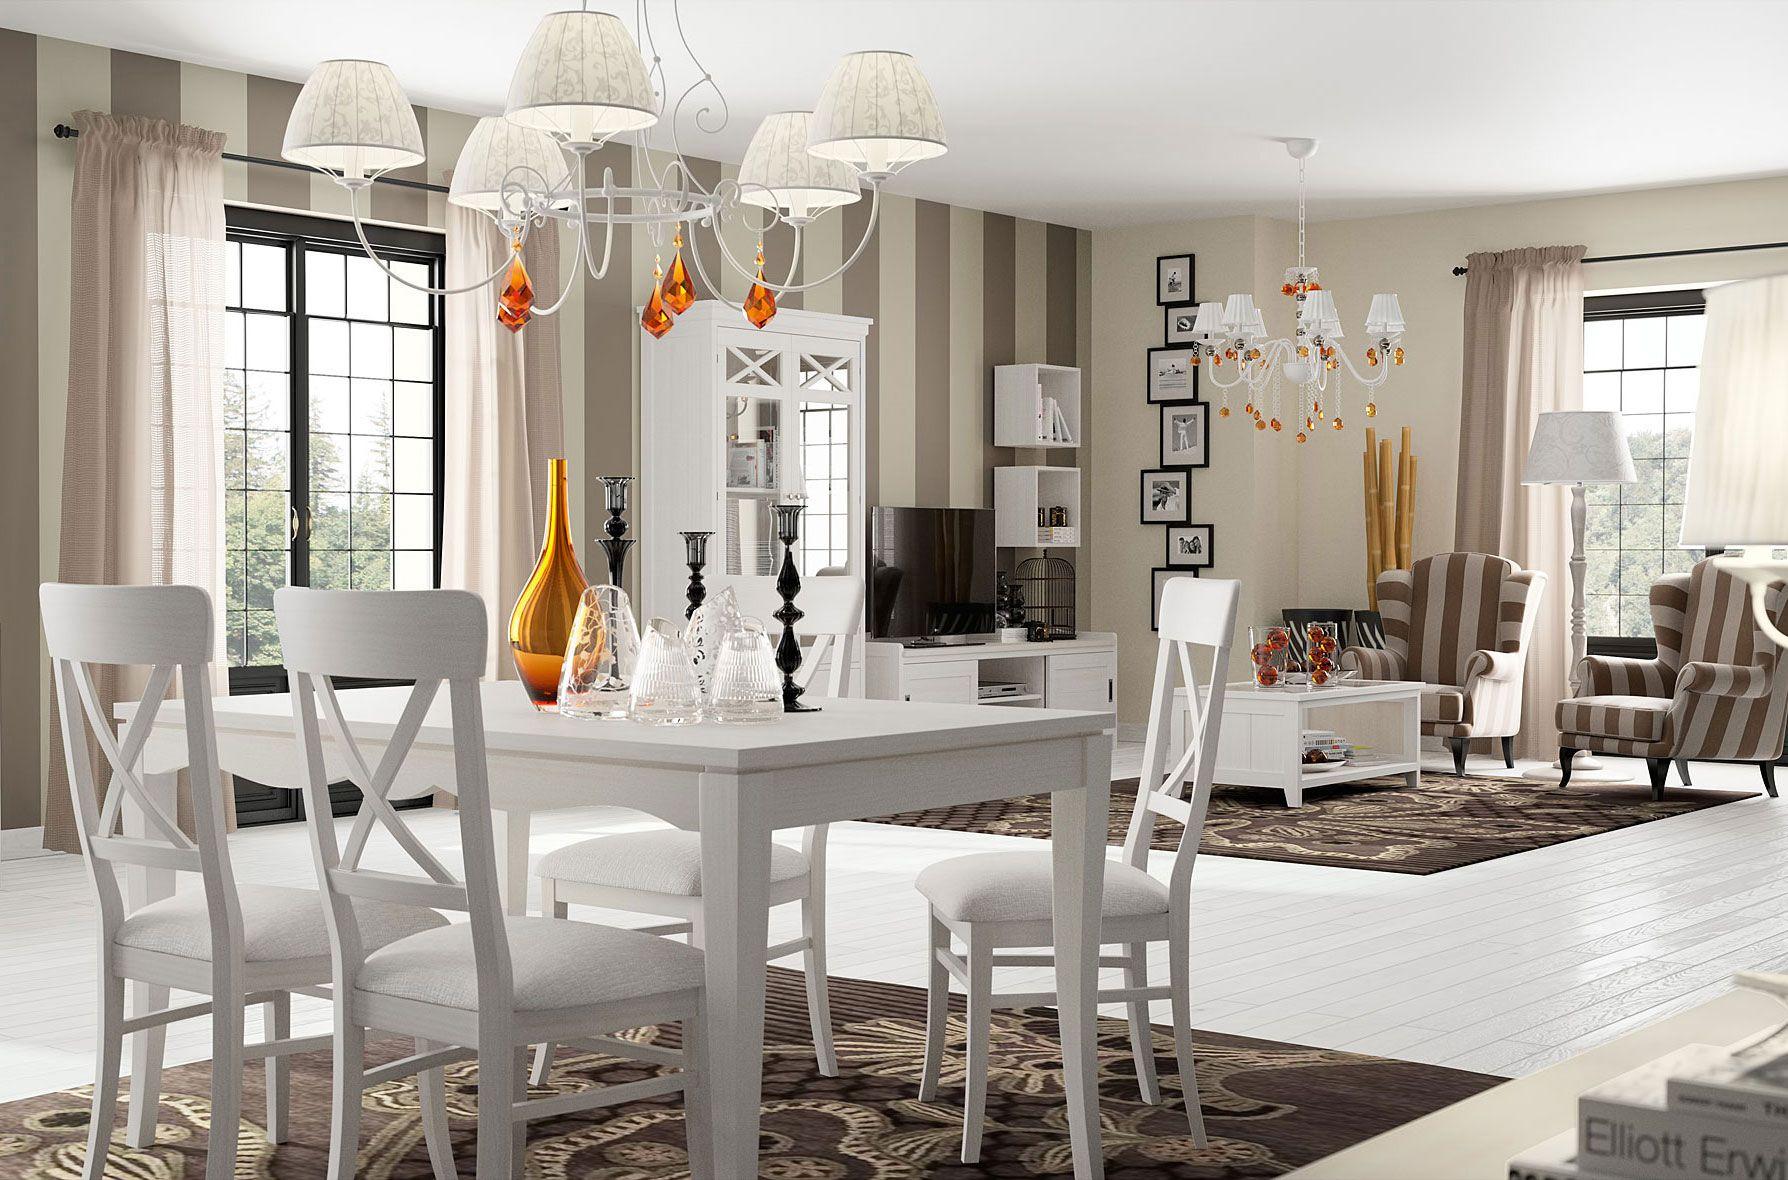 salon vintage moderno mueble marron - Buscar con Google | Deco white ...